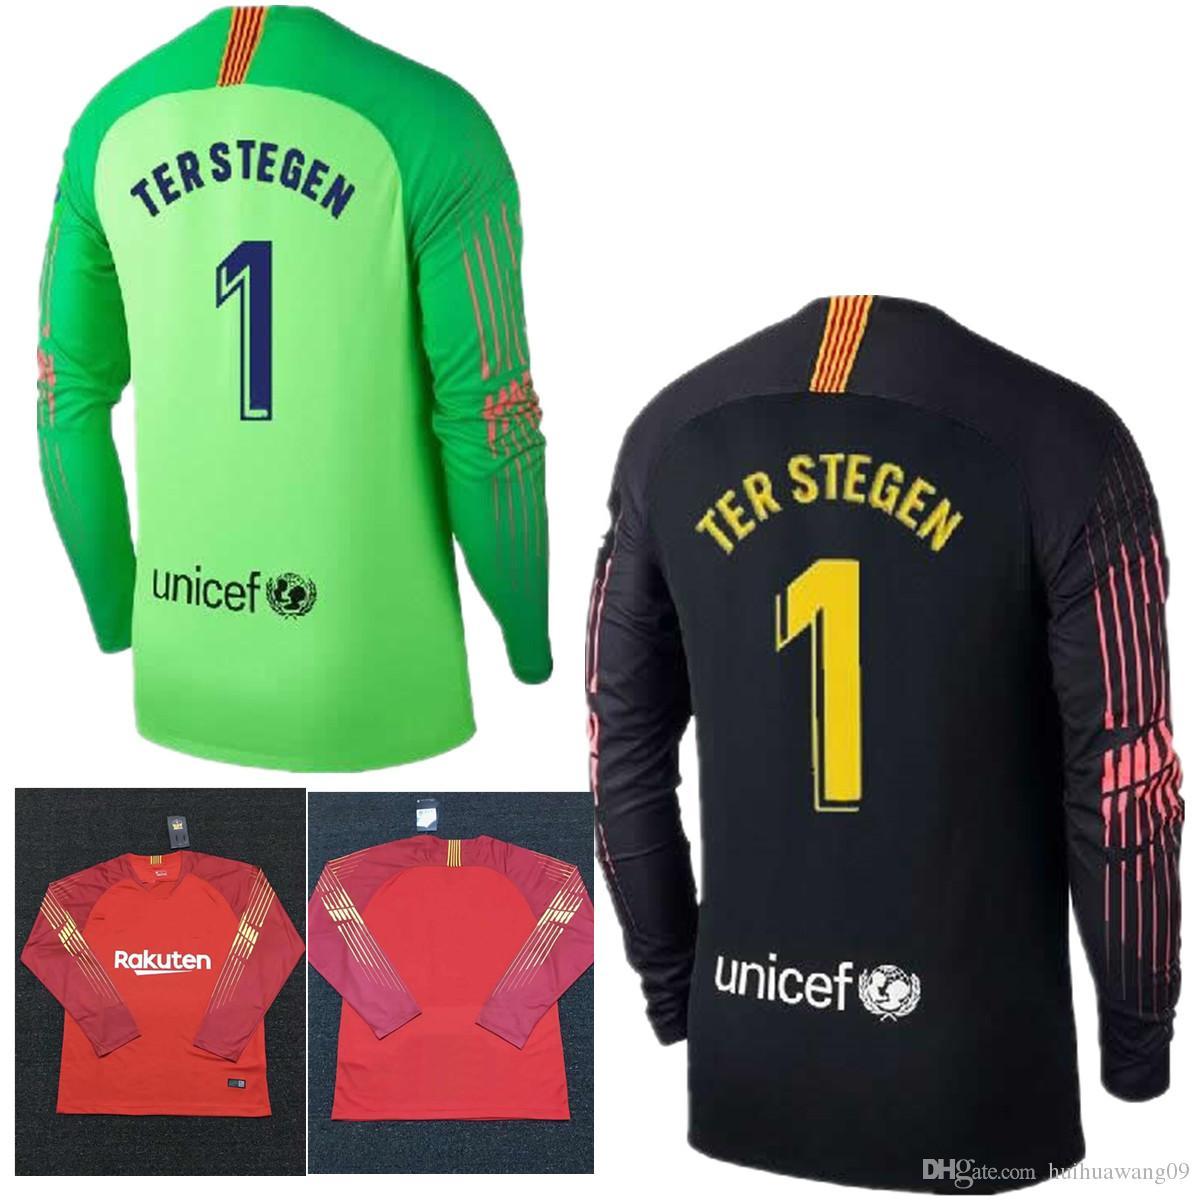 2019 2018 2019 Adults Long Sleeve Ter Stegen Goalkeeper Jersey Soccer  Jerseys  1 Marc Andre Ter Stegen Goalie Jersey Black Orange Football Shirts  From ... f803cc052